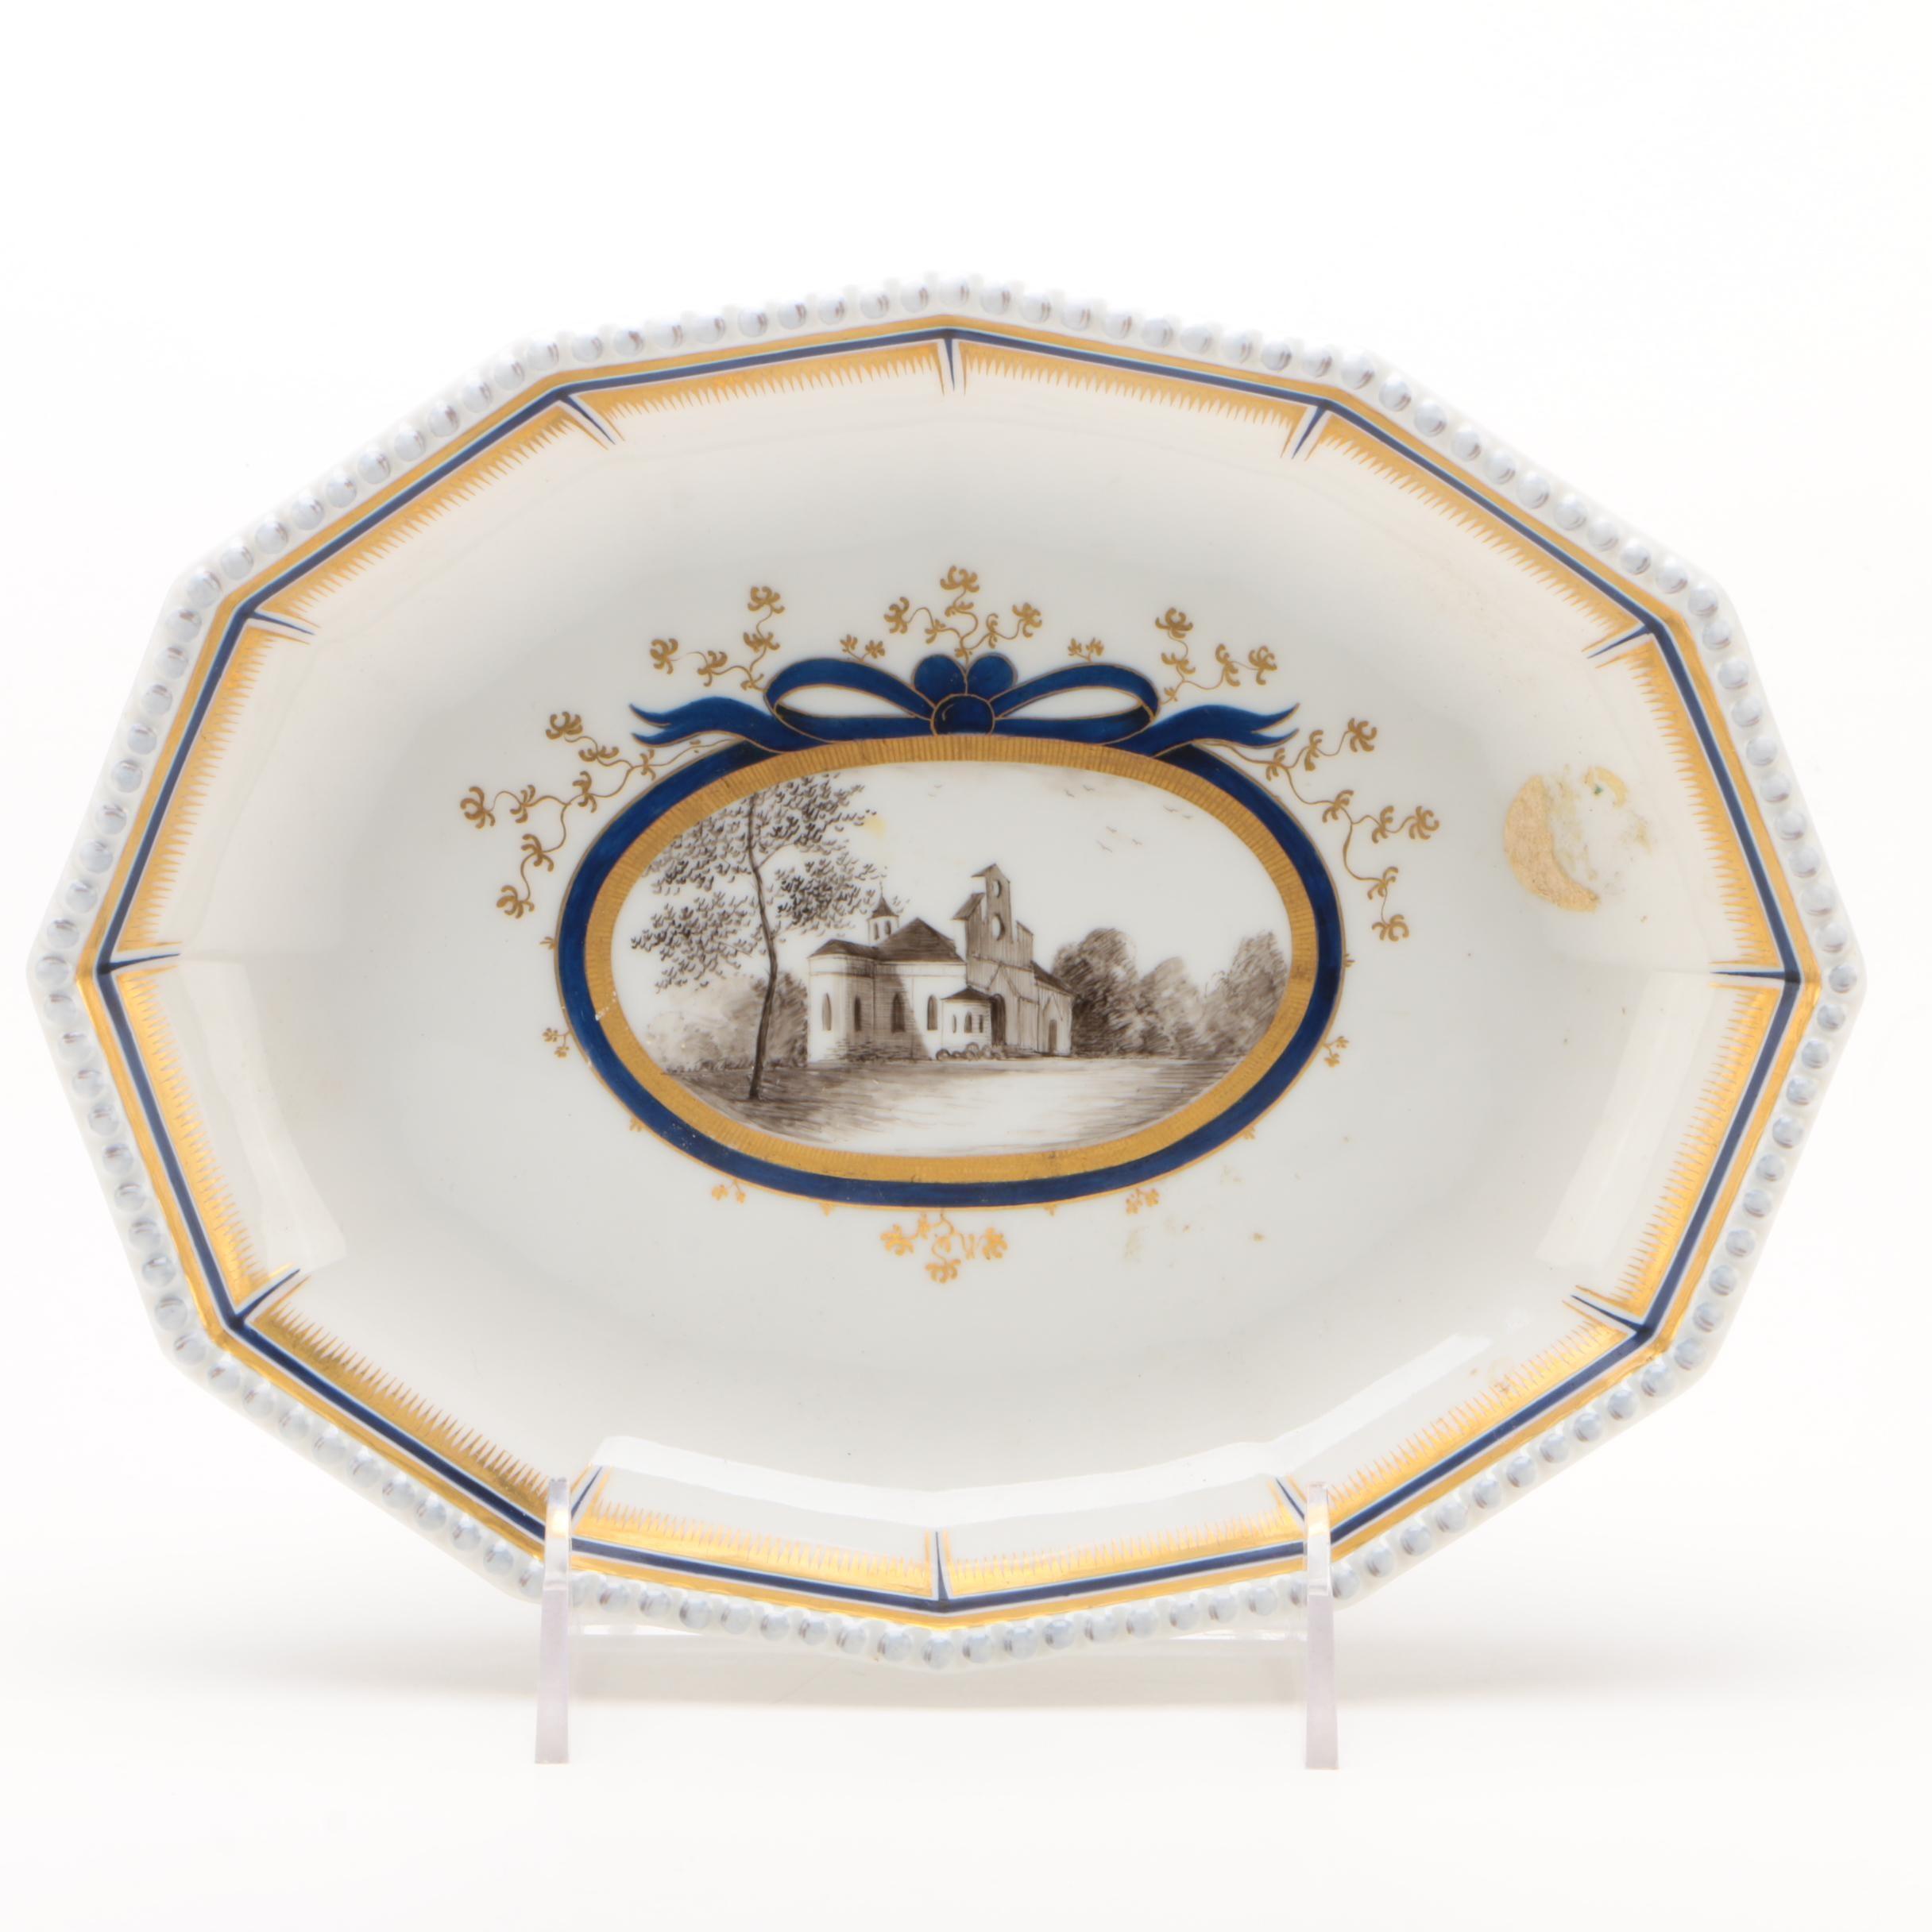 Nymphenburg Porcelain Bowl with Magdalenen Kapelle Scene, 1910-1975